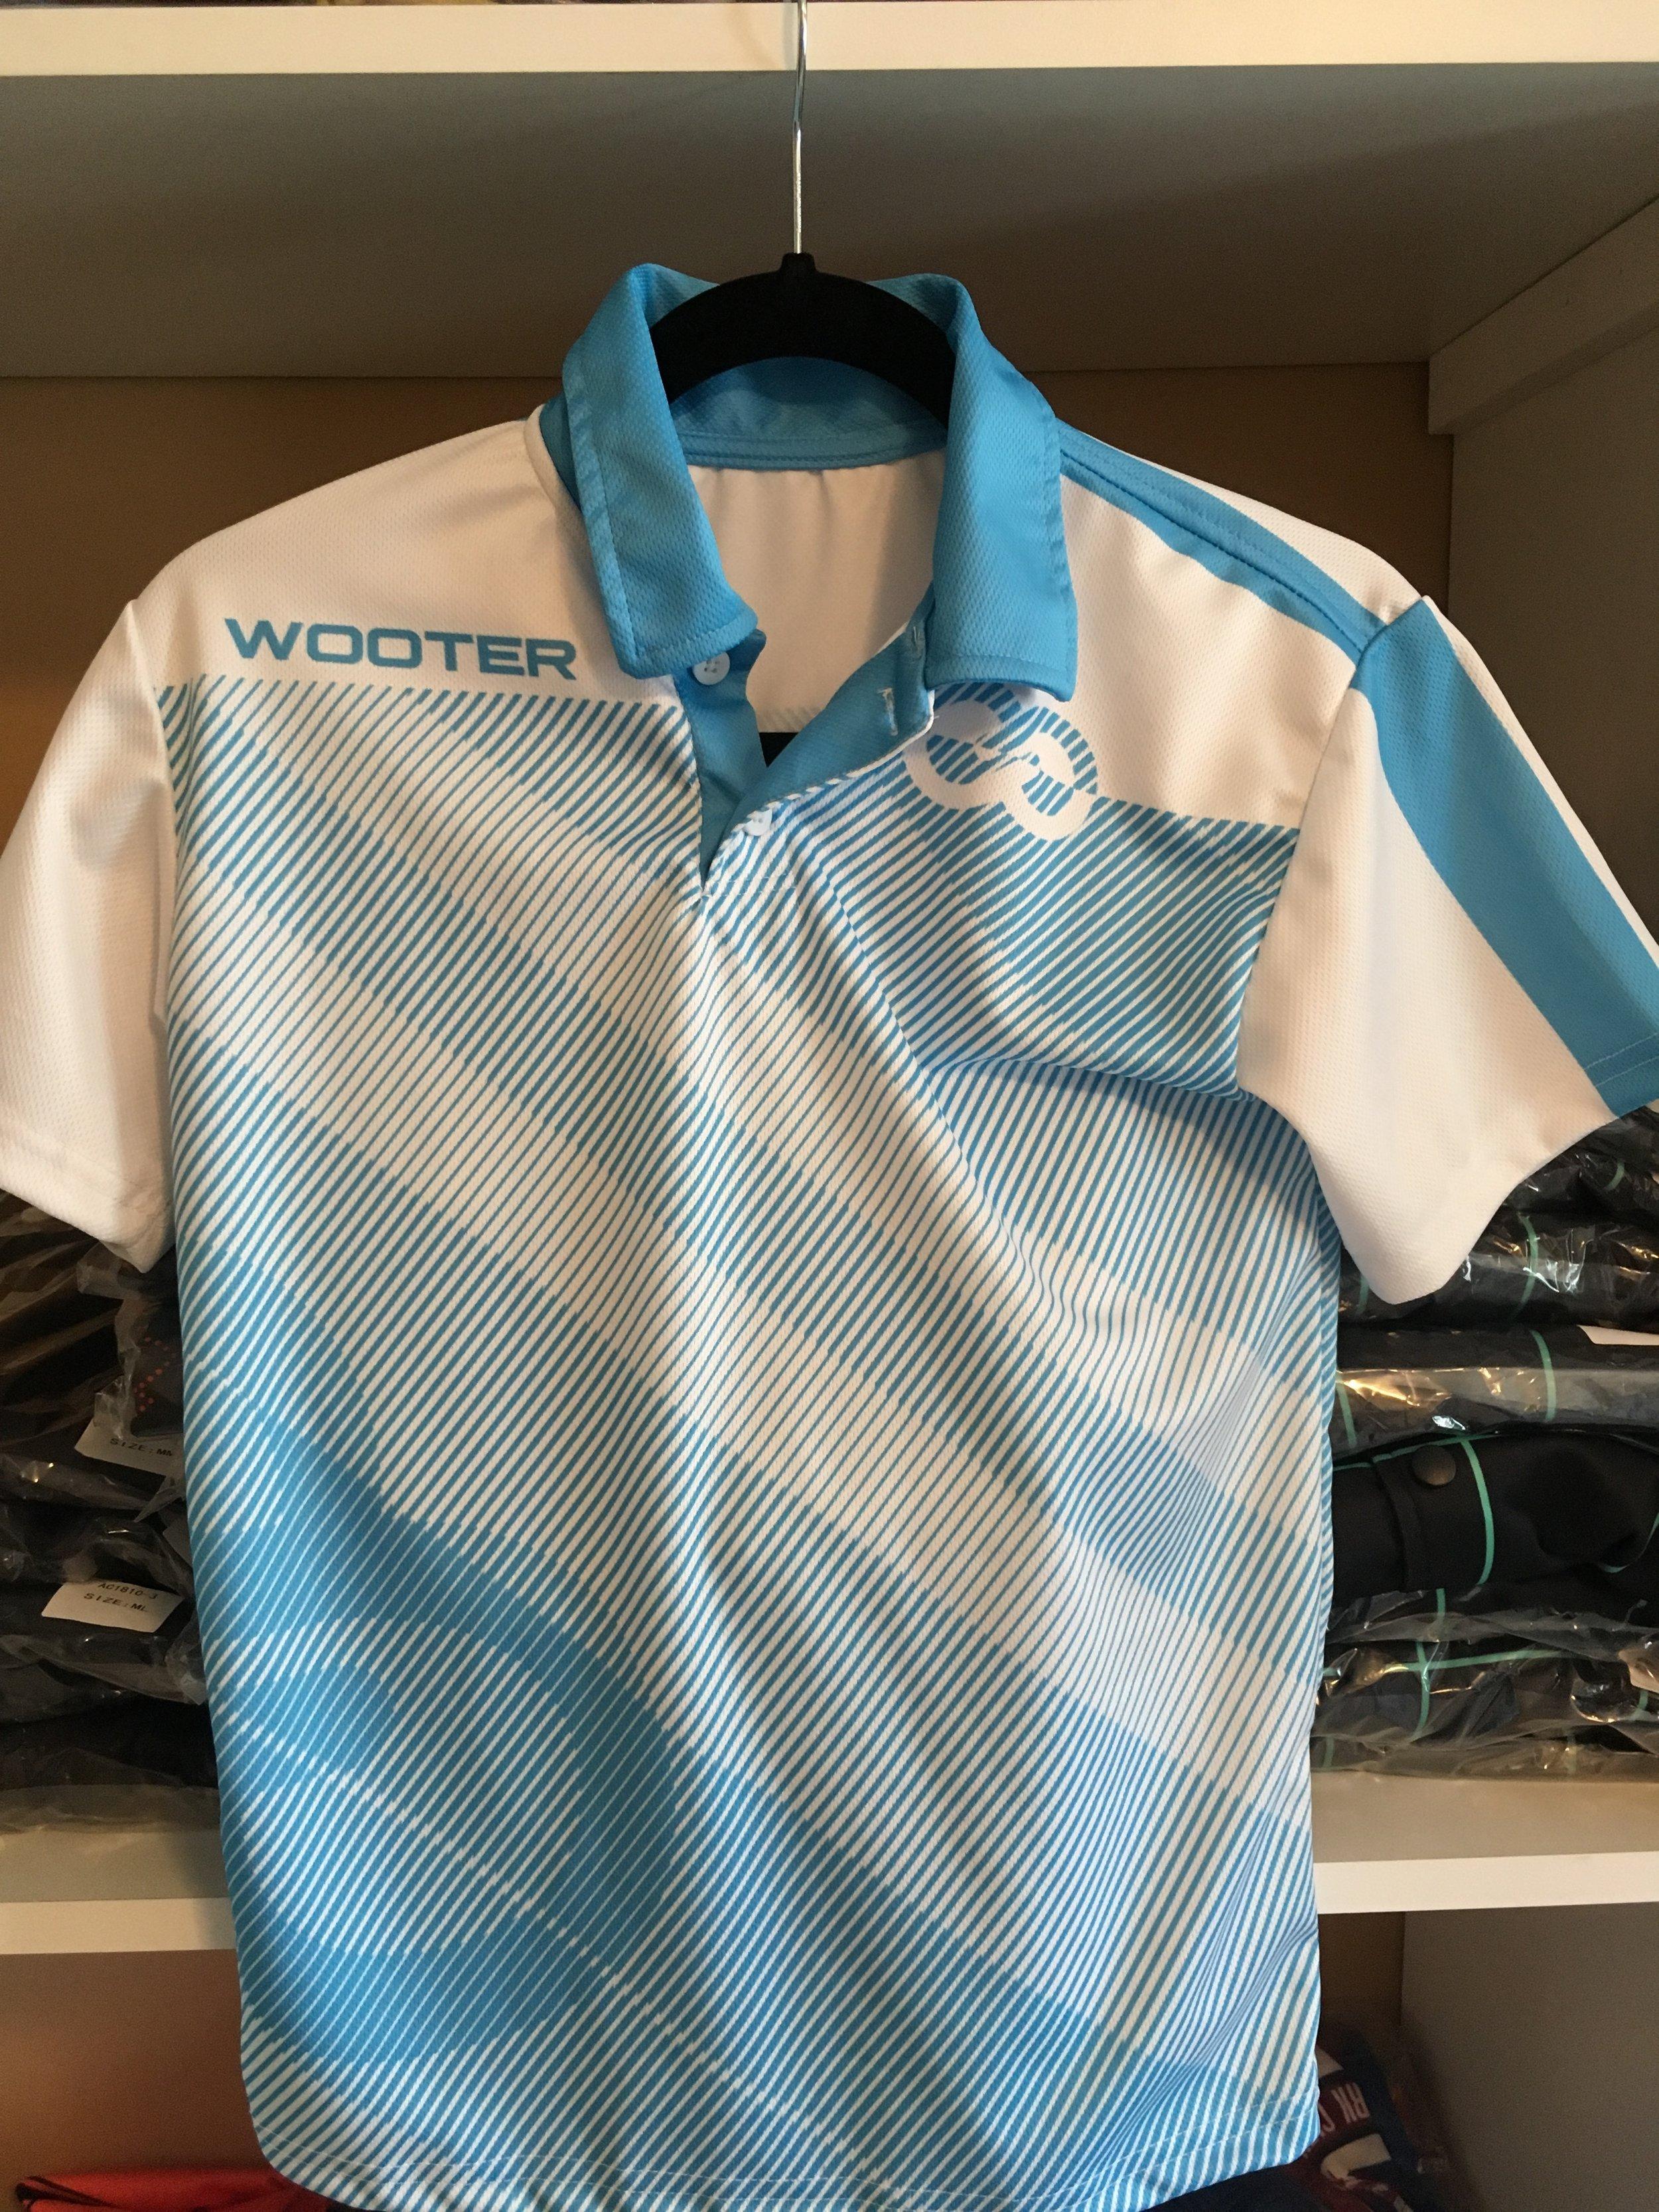 Sky Blue and White Lacrosse Uniform Polo shirt